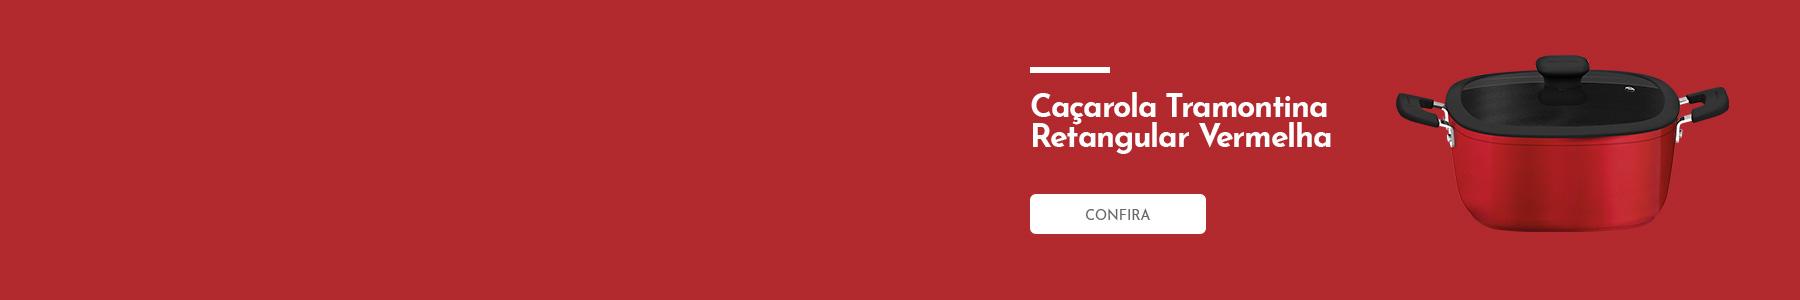 Carrossel Categoria - 1 banner